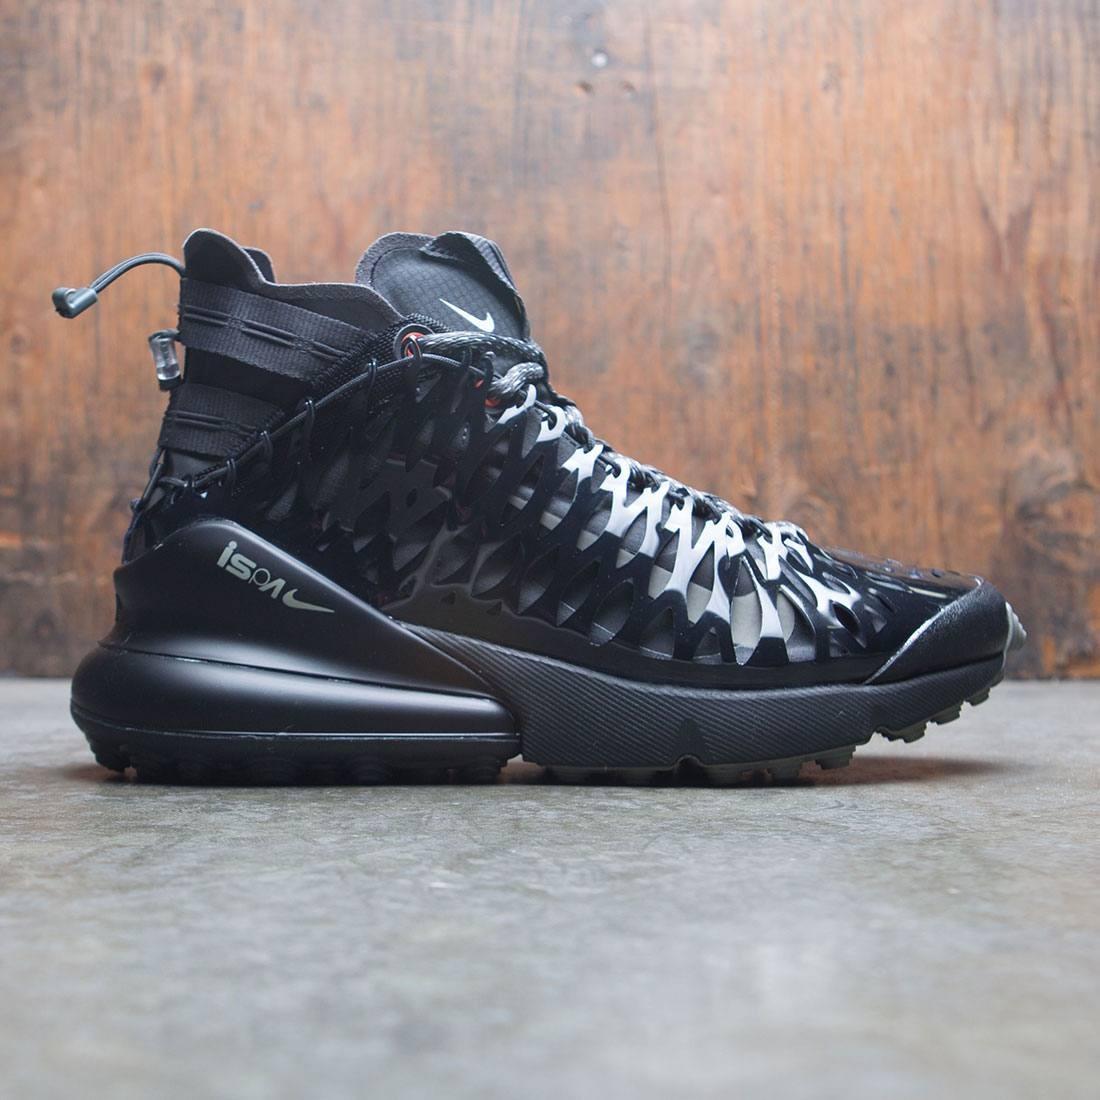 Nike Men Air Max 270 Ispa (black / anthracite-dark stucco)